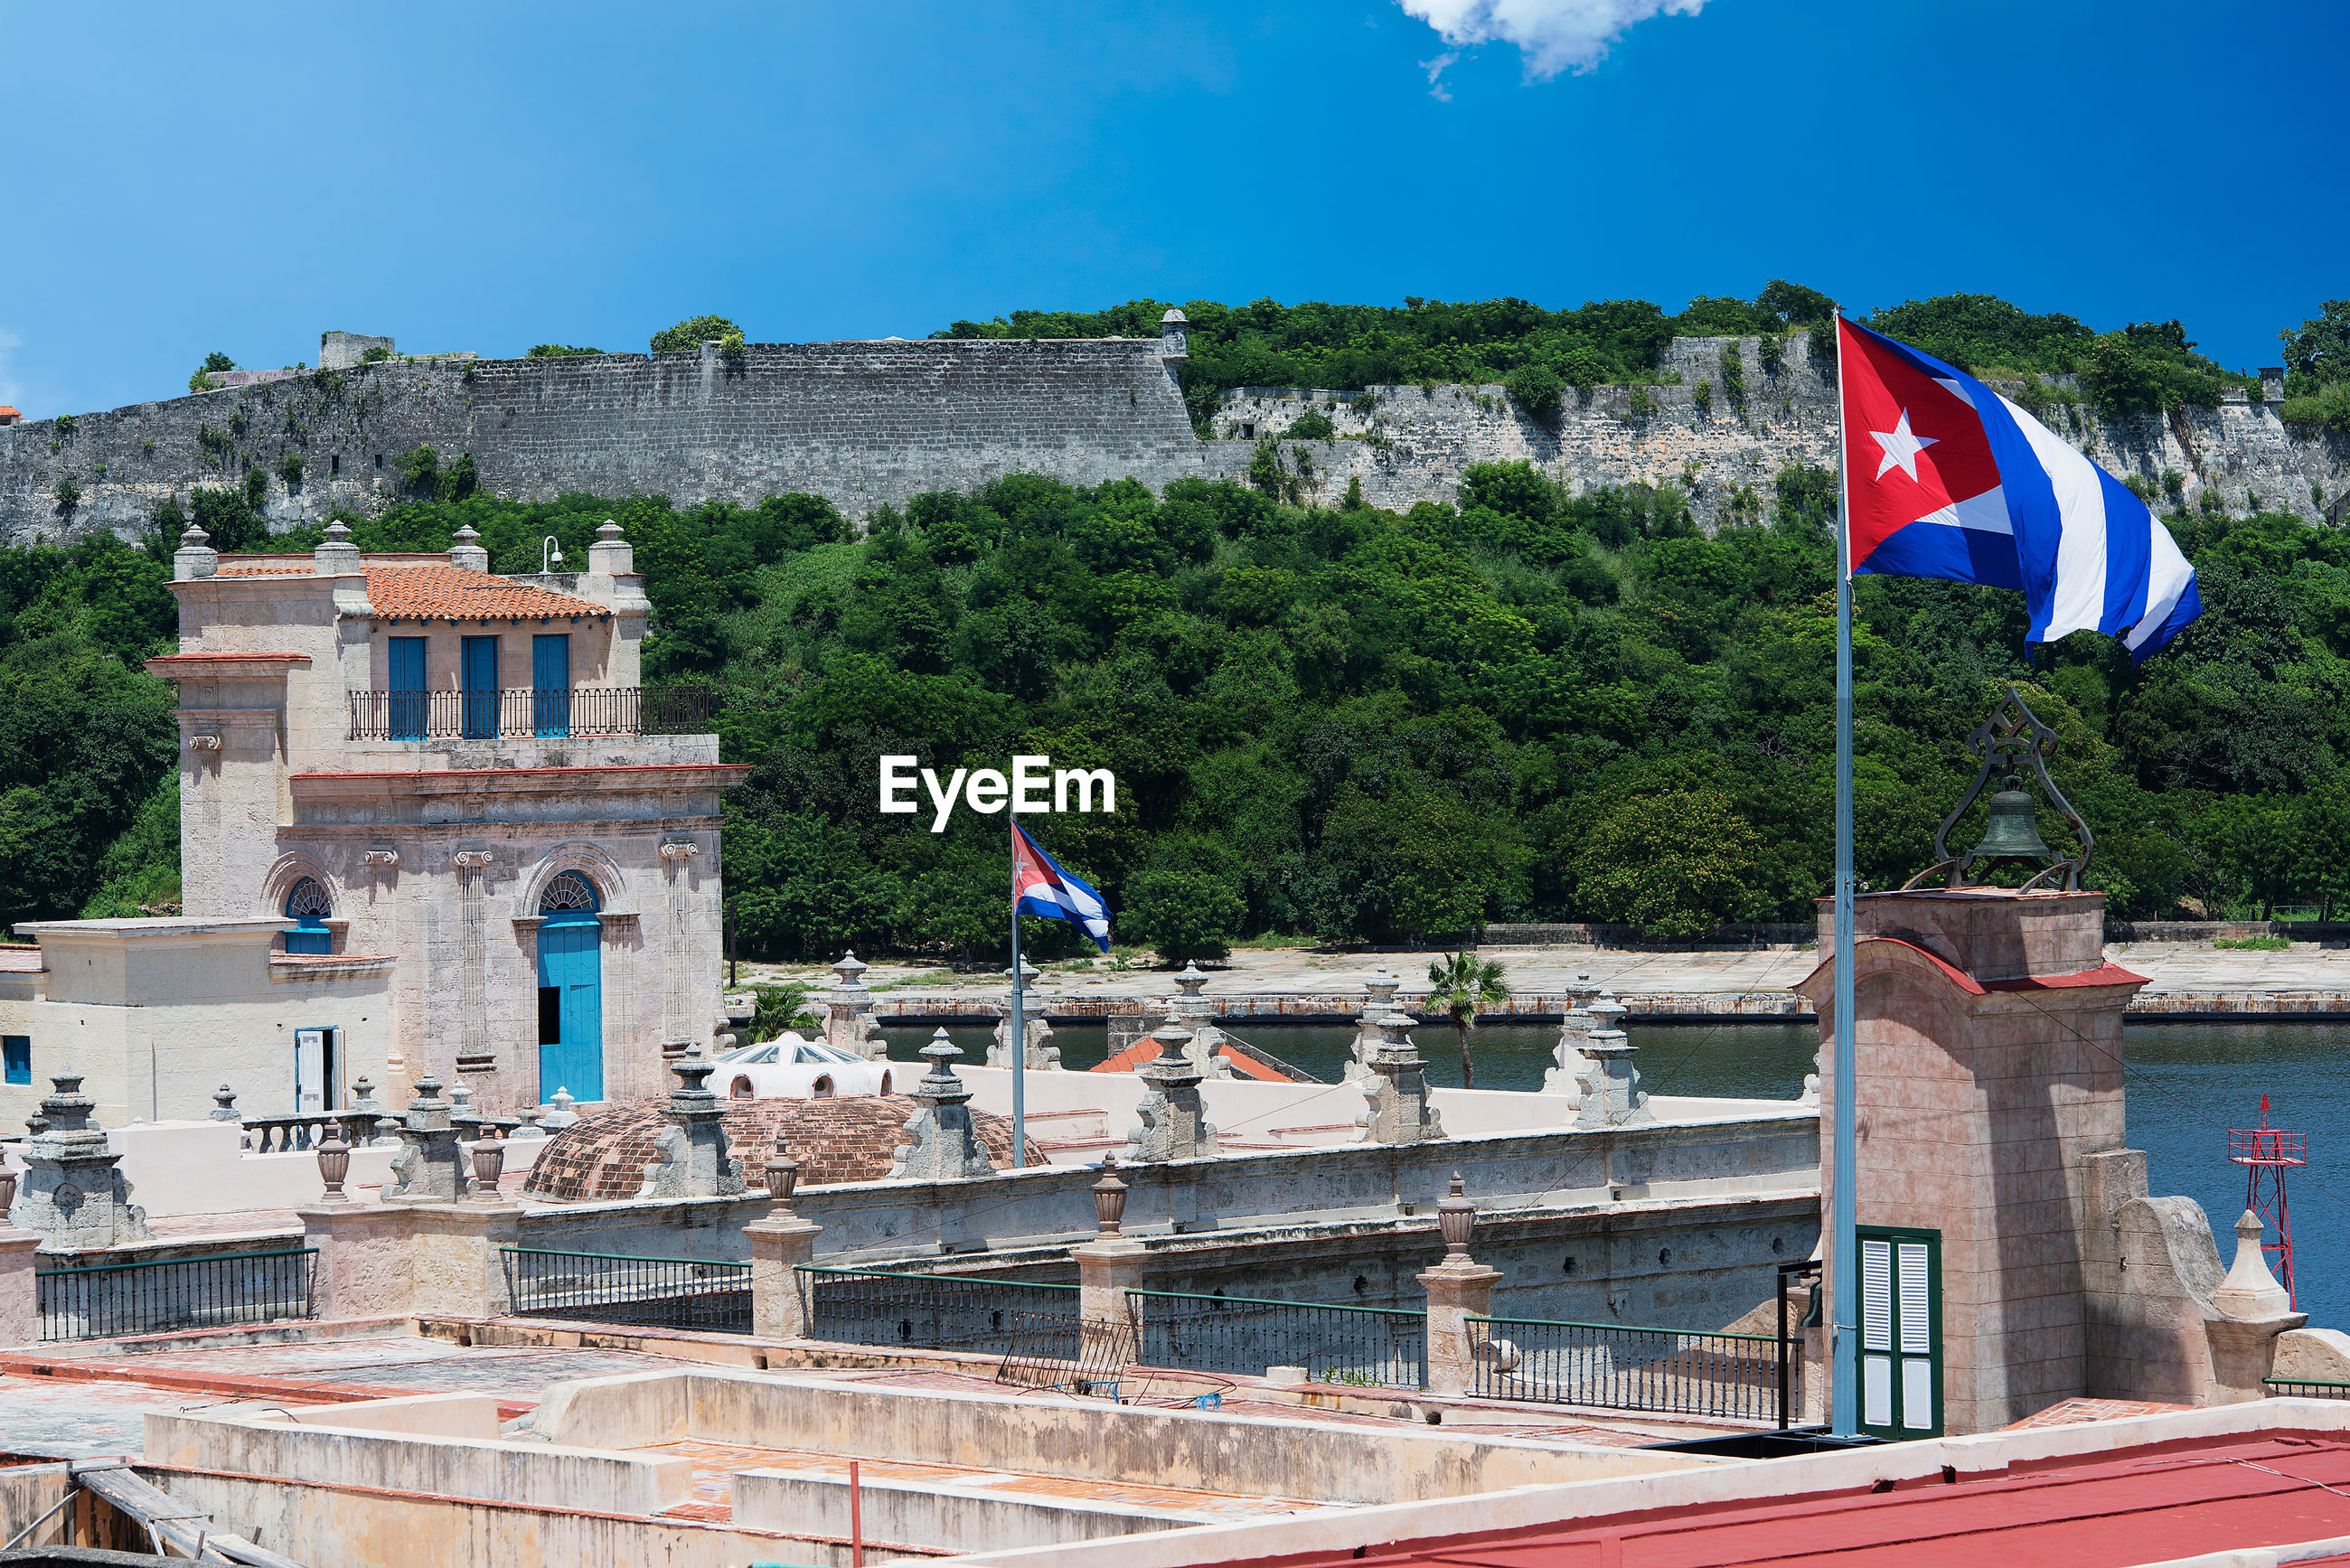 Cuban flags on historic buildings